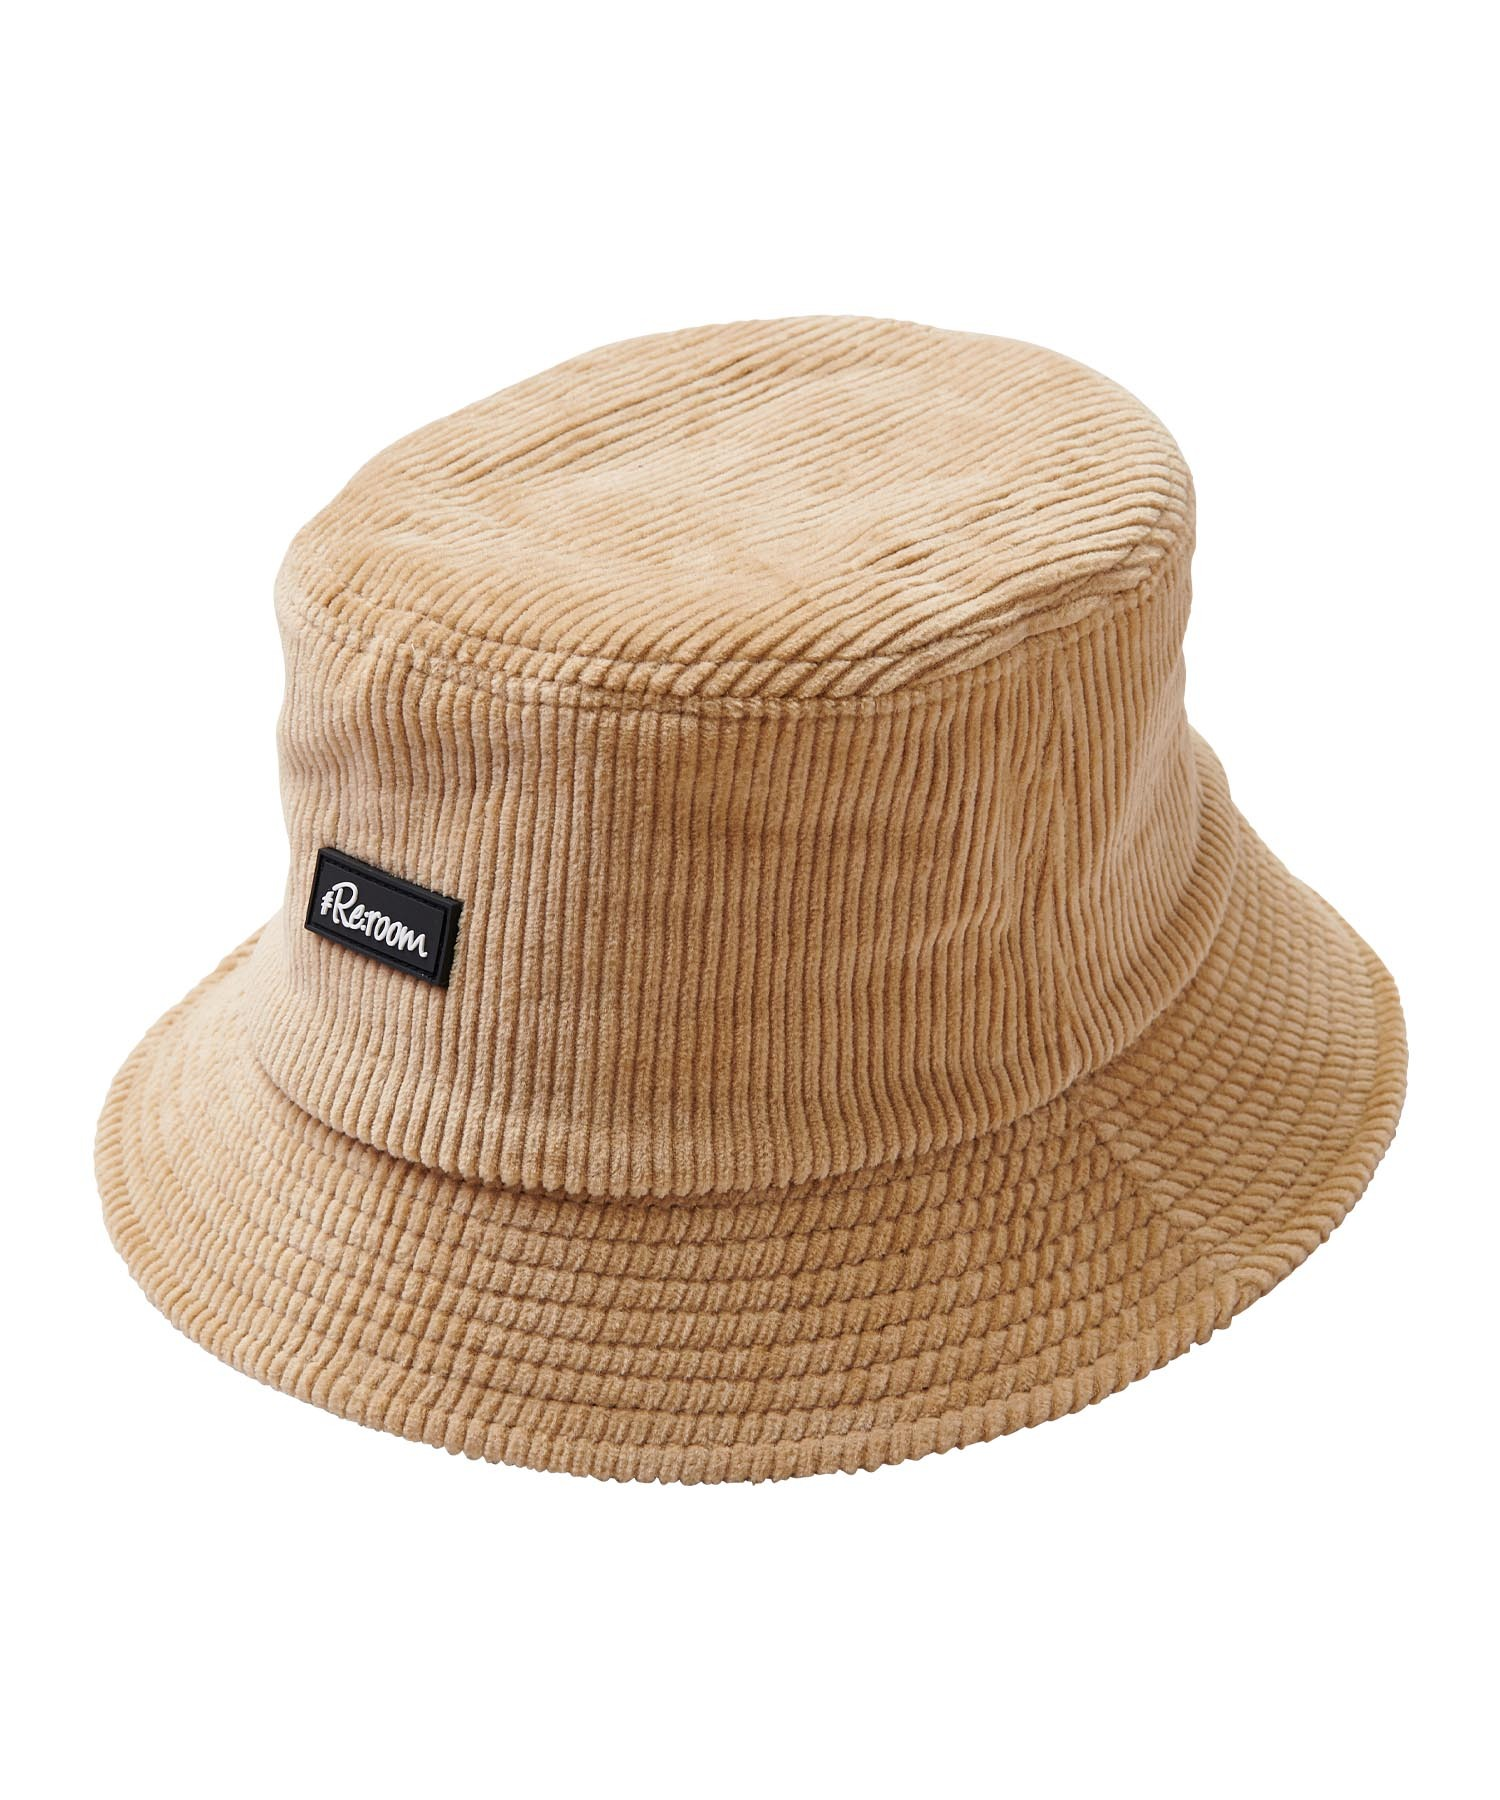 RUBBER WAPPEN CORDUROY BUCKET HAT[REH097]